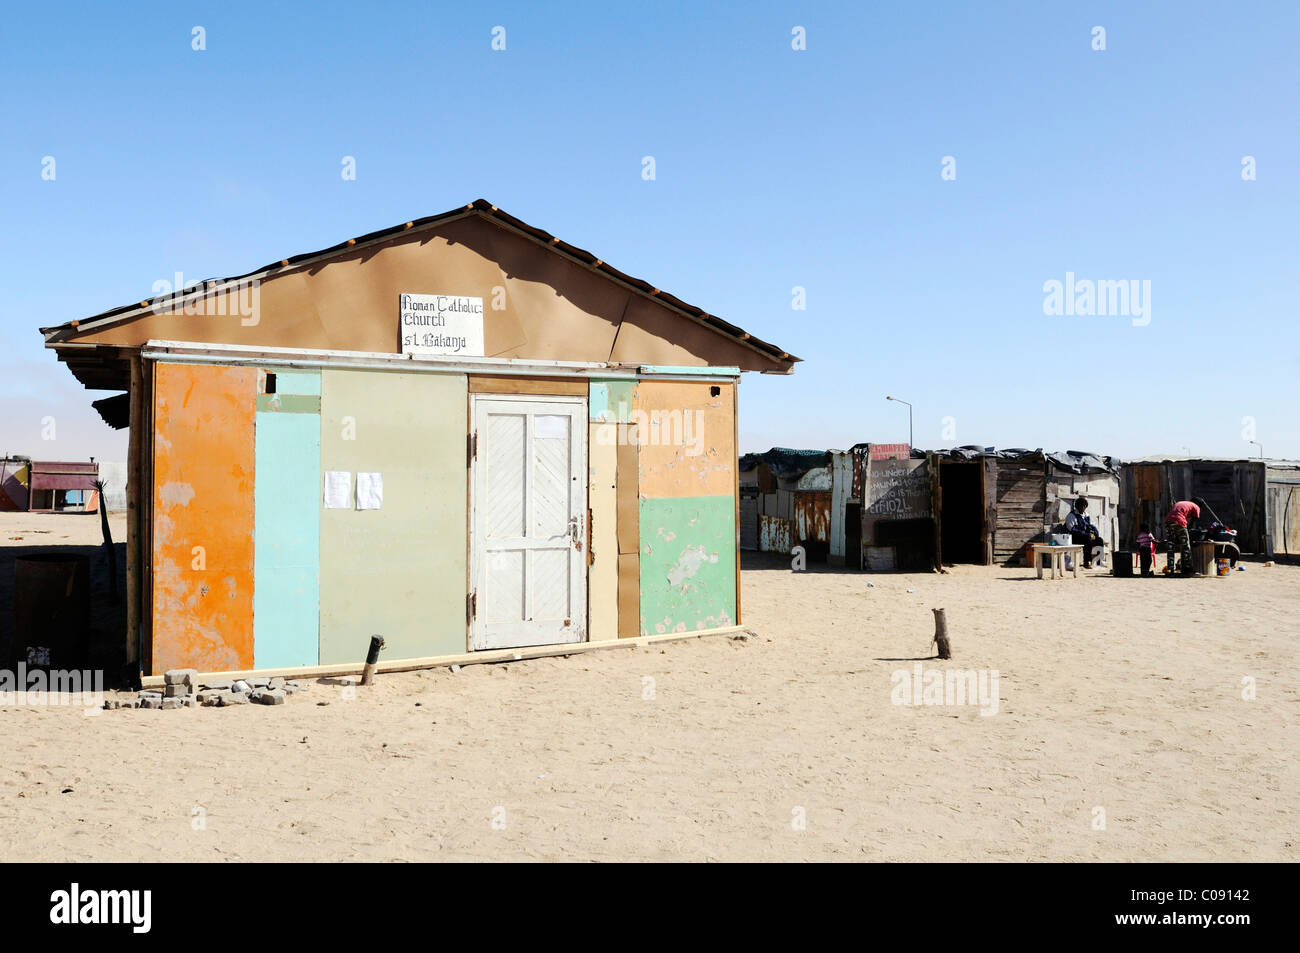 Catholic church in the Mondesa township, Swakopmund town, Namibia, Africa - Stock Image